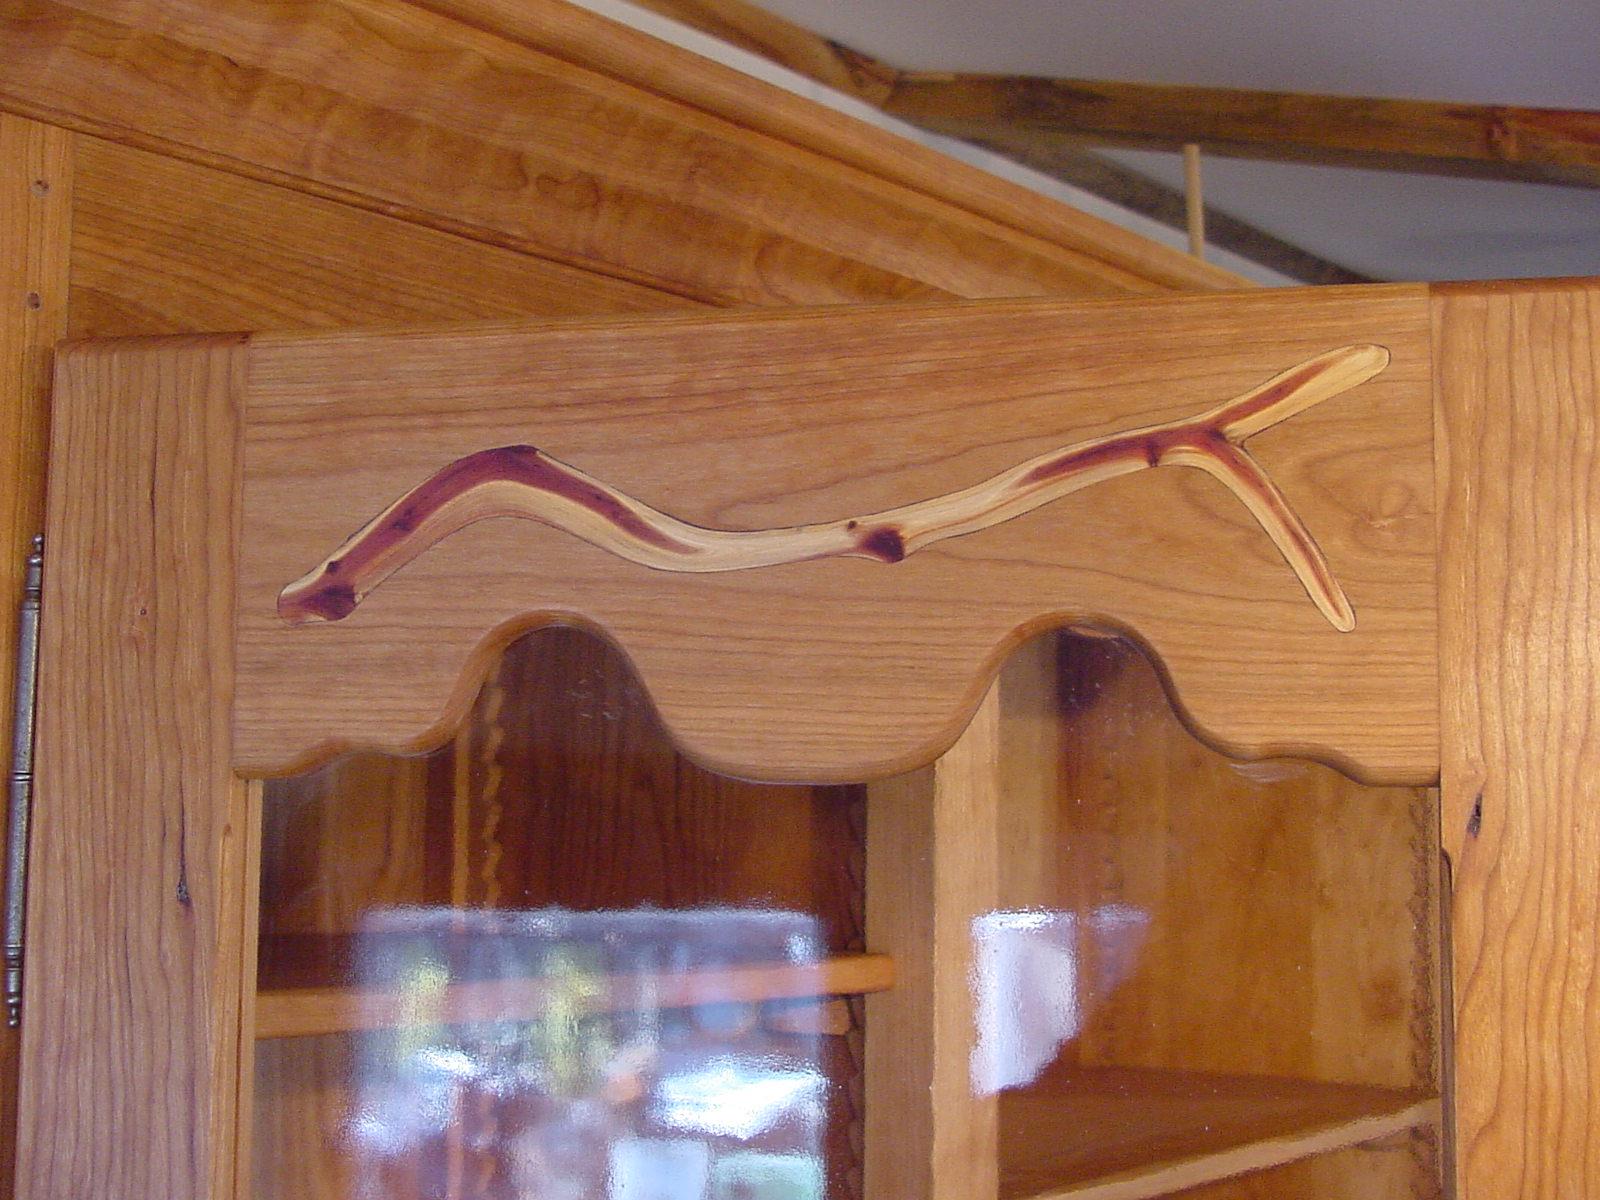 Eastern Red Cedar stick inlay